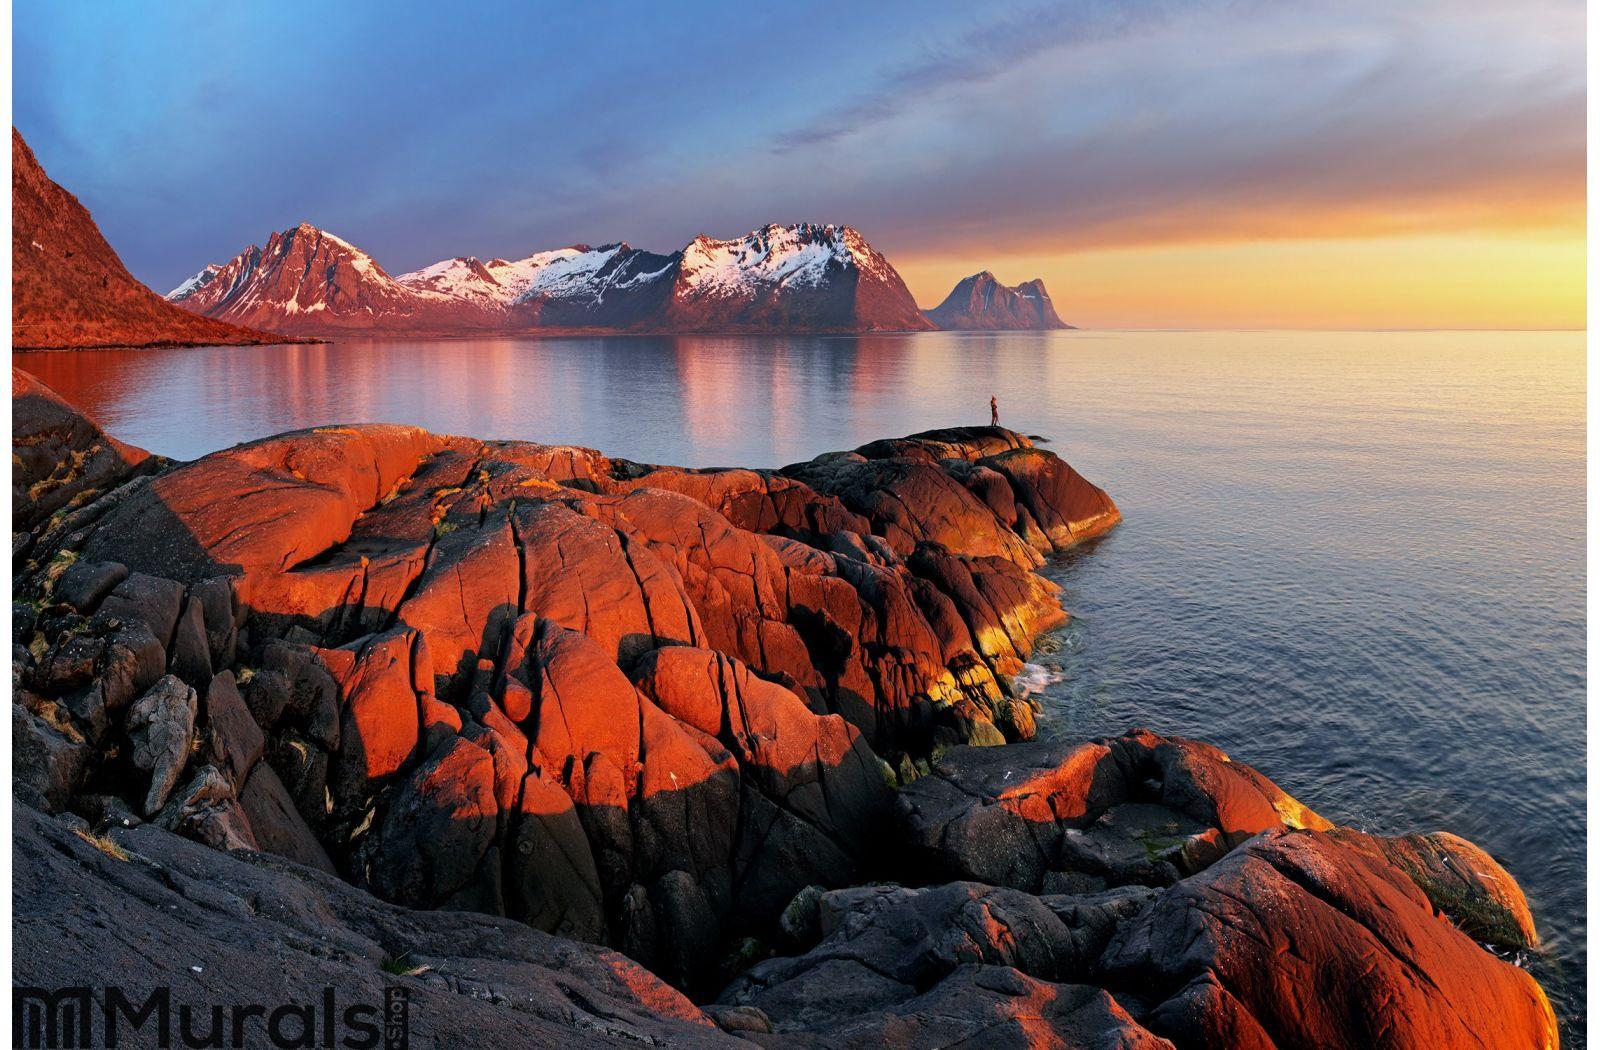 Ocean mountain panorama sunset - Norway Wall Mural